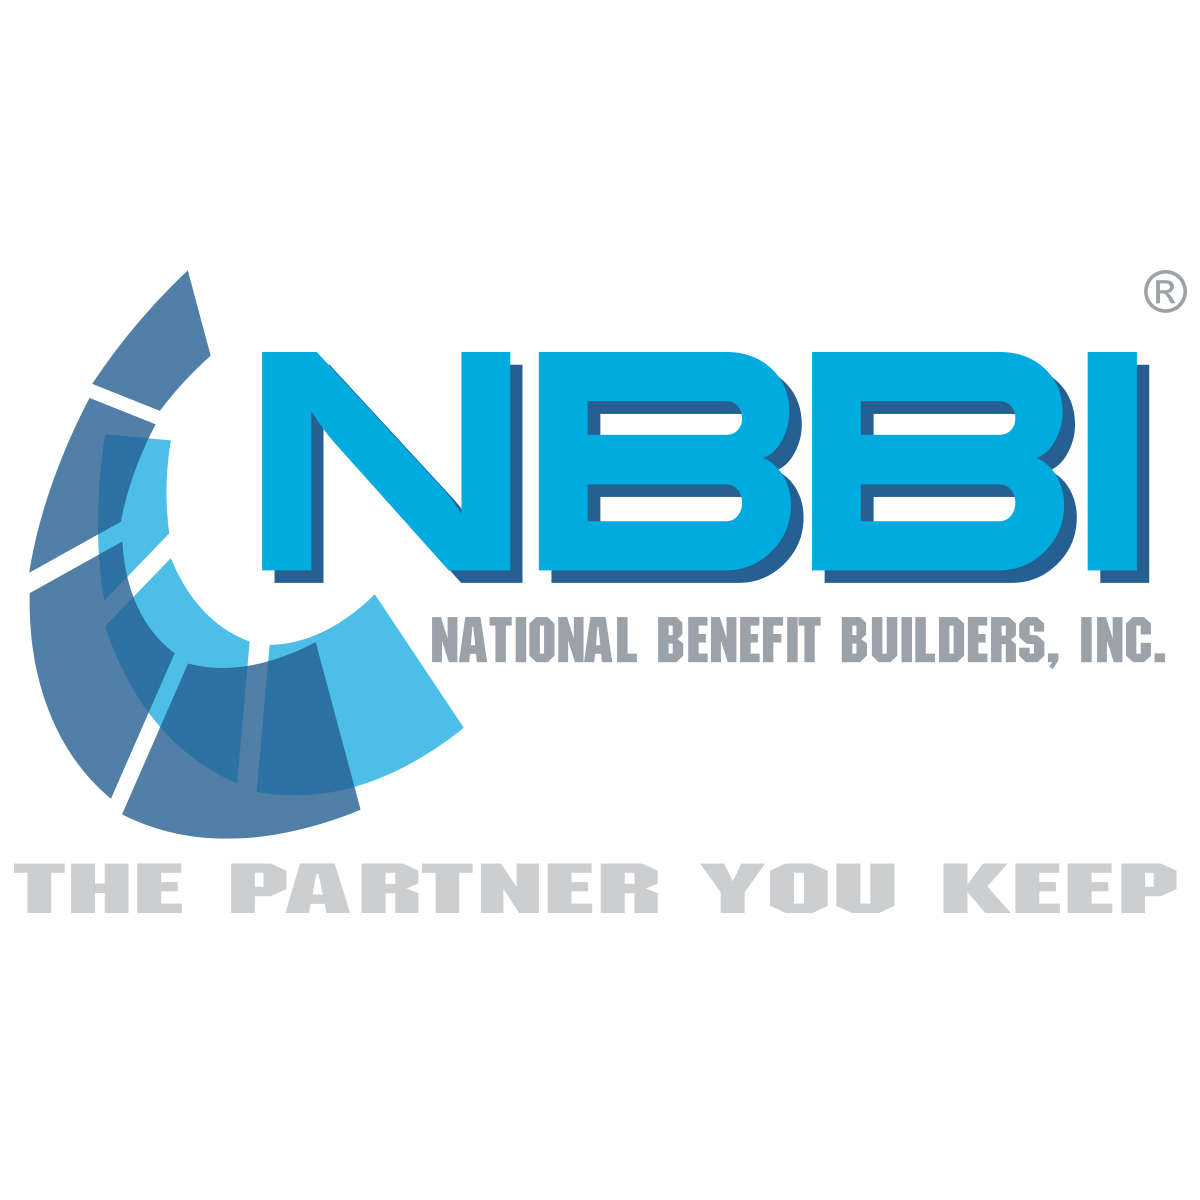 National Benefit Builders, Inc. image 4